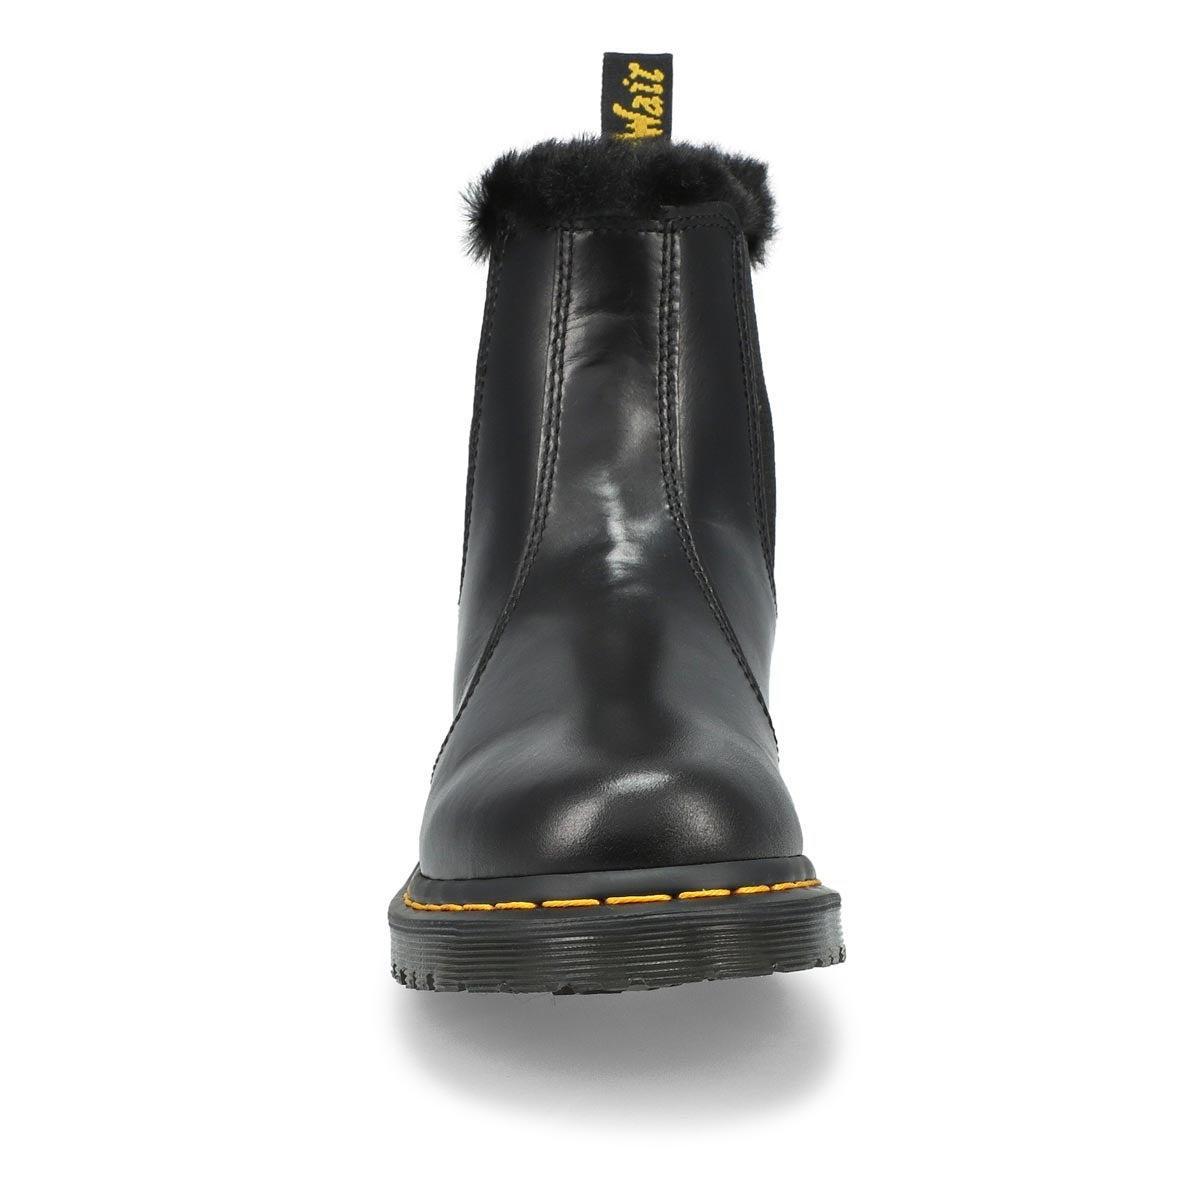 Women's 2976 Leonore Atlas Chelsea Boot - Black